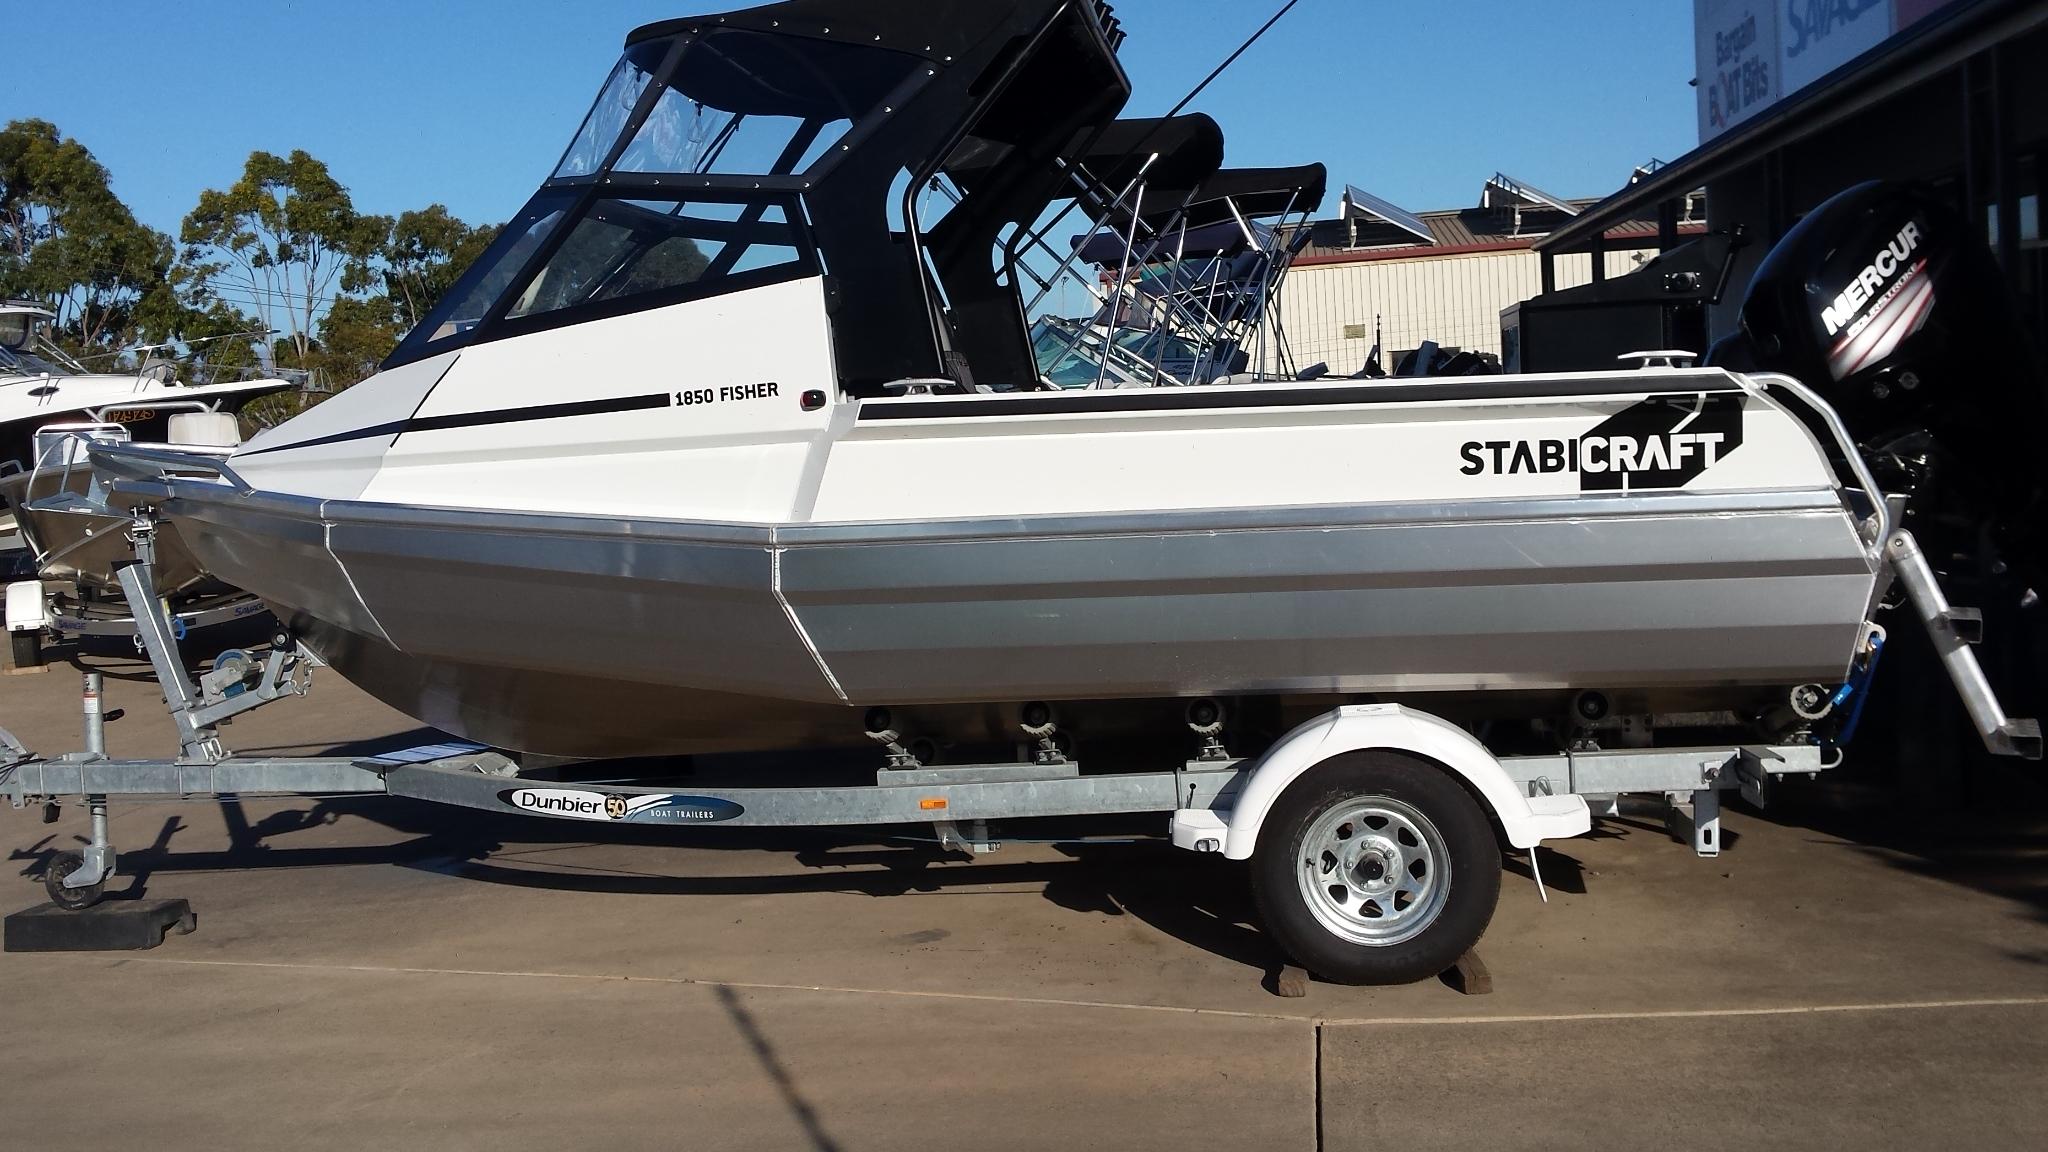 2020 Stabicraft 1850 Sportsfish